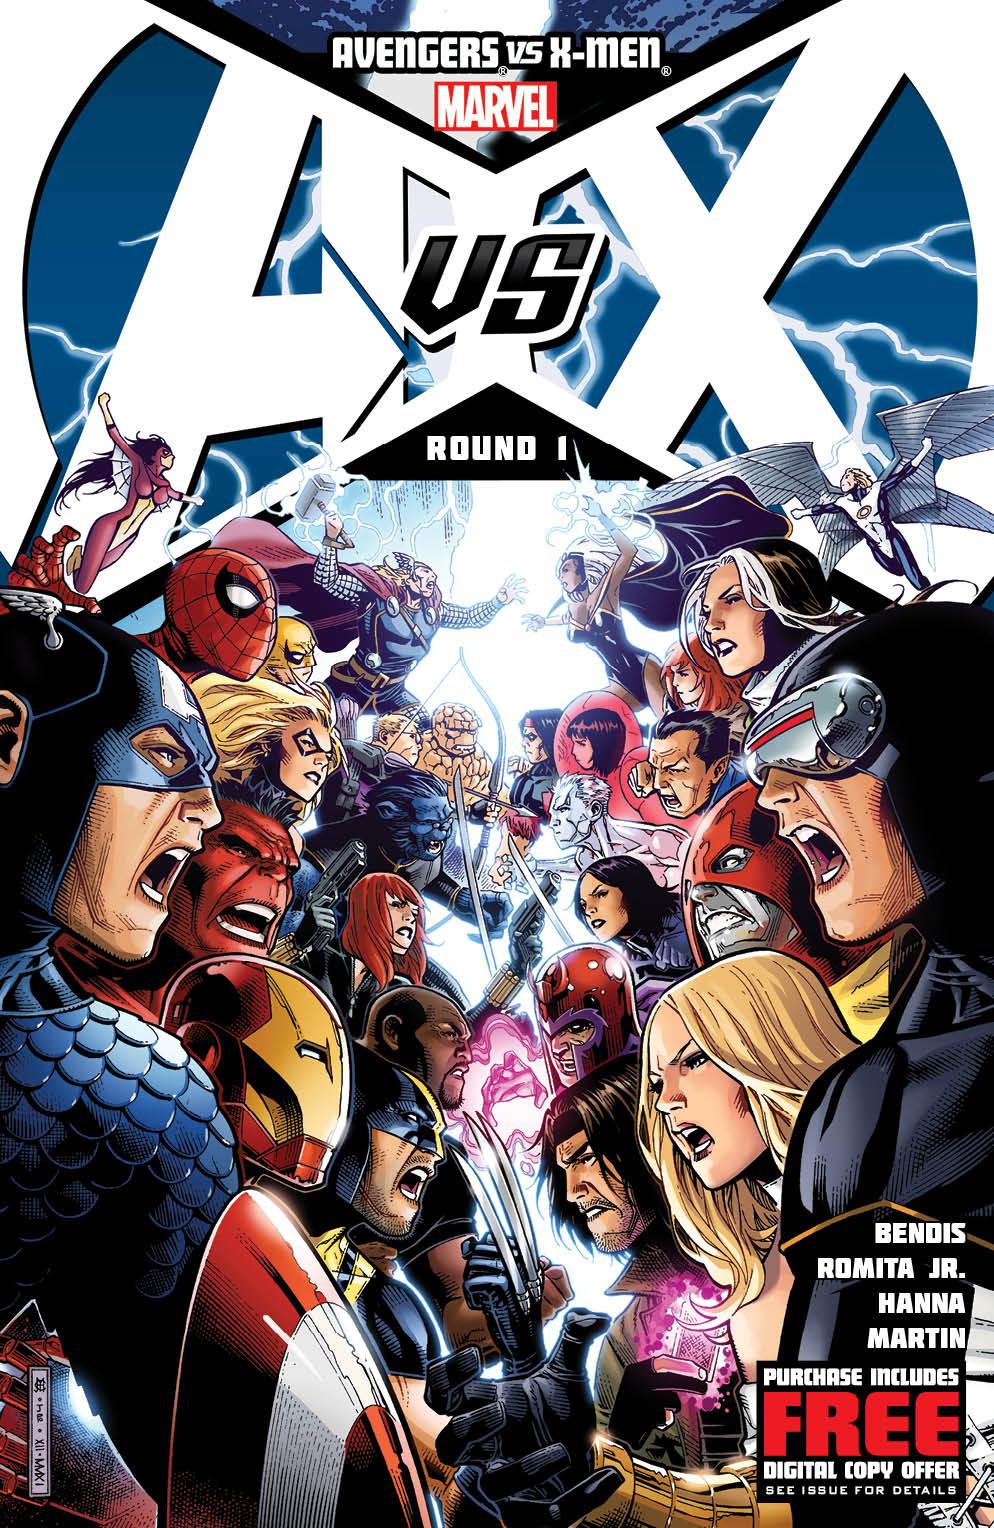 Marvel Unveils Cover To AVENGERS VS. X-MEN #1